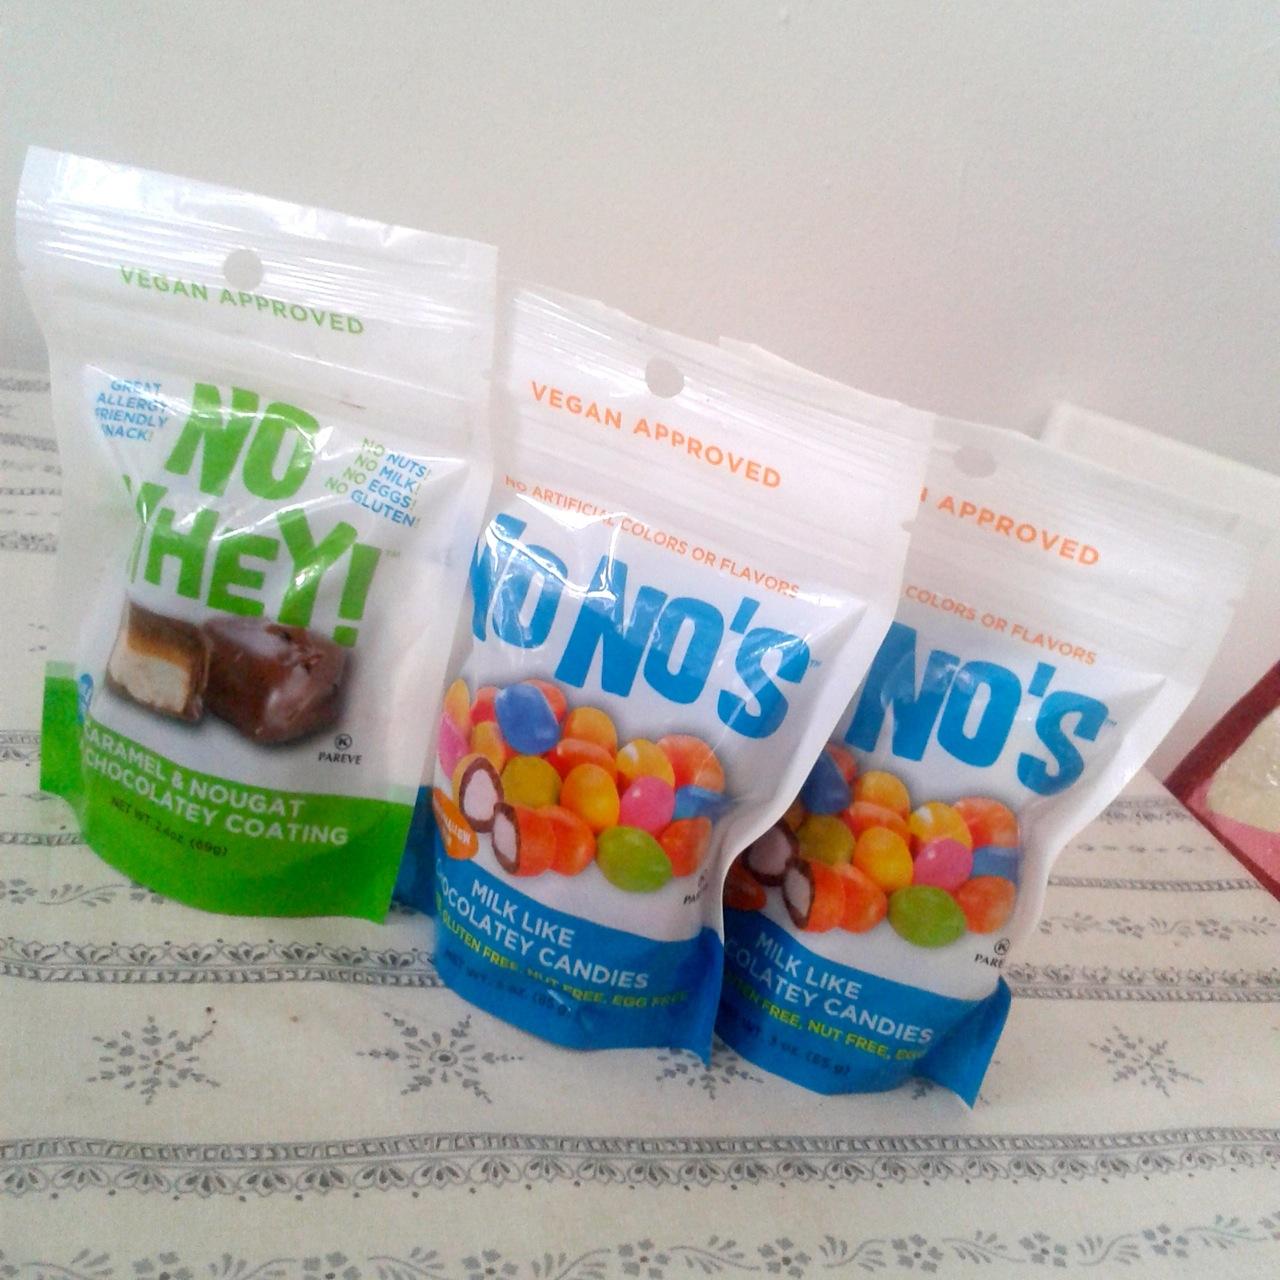 http://i0.wp.com/fatgayvegan.com/wp-content/uploads/2014/10/candy.jpg?fit=1280%2C1280